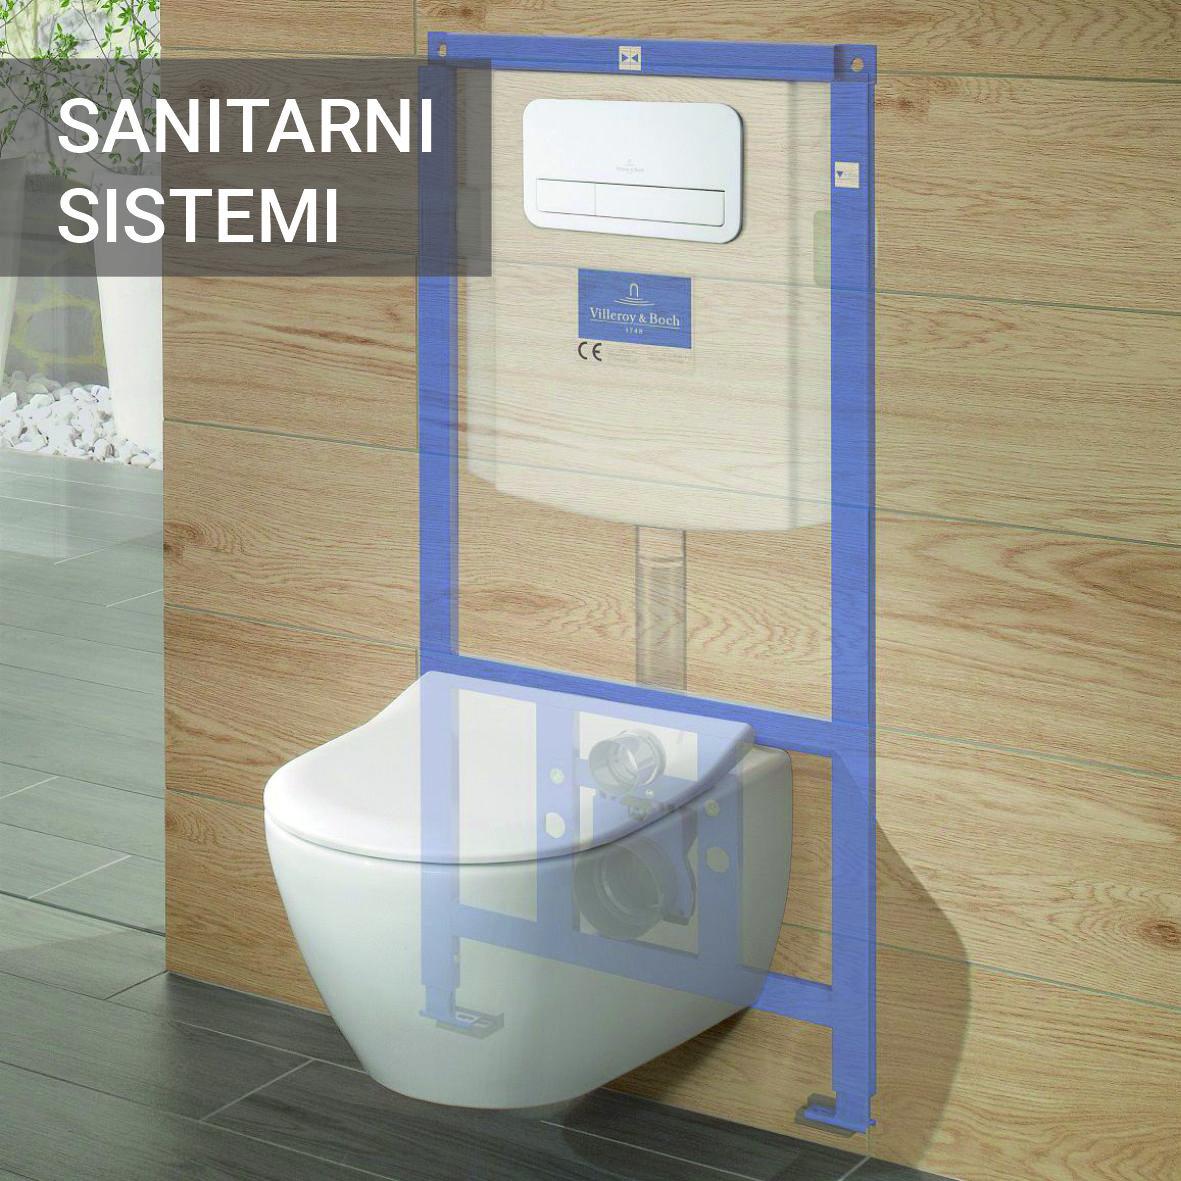 Sanitarni sistemi Villeroy & Boch, Geohe